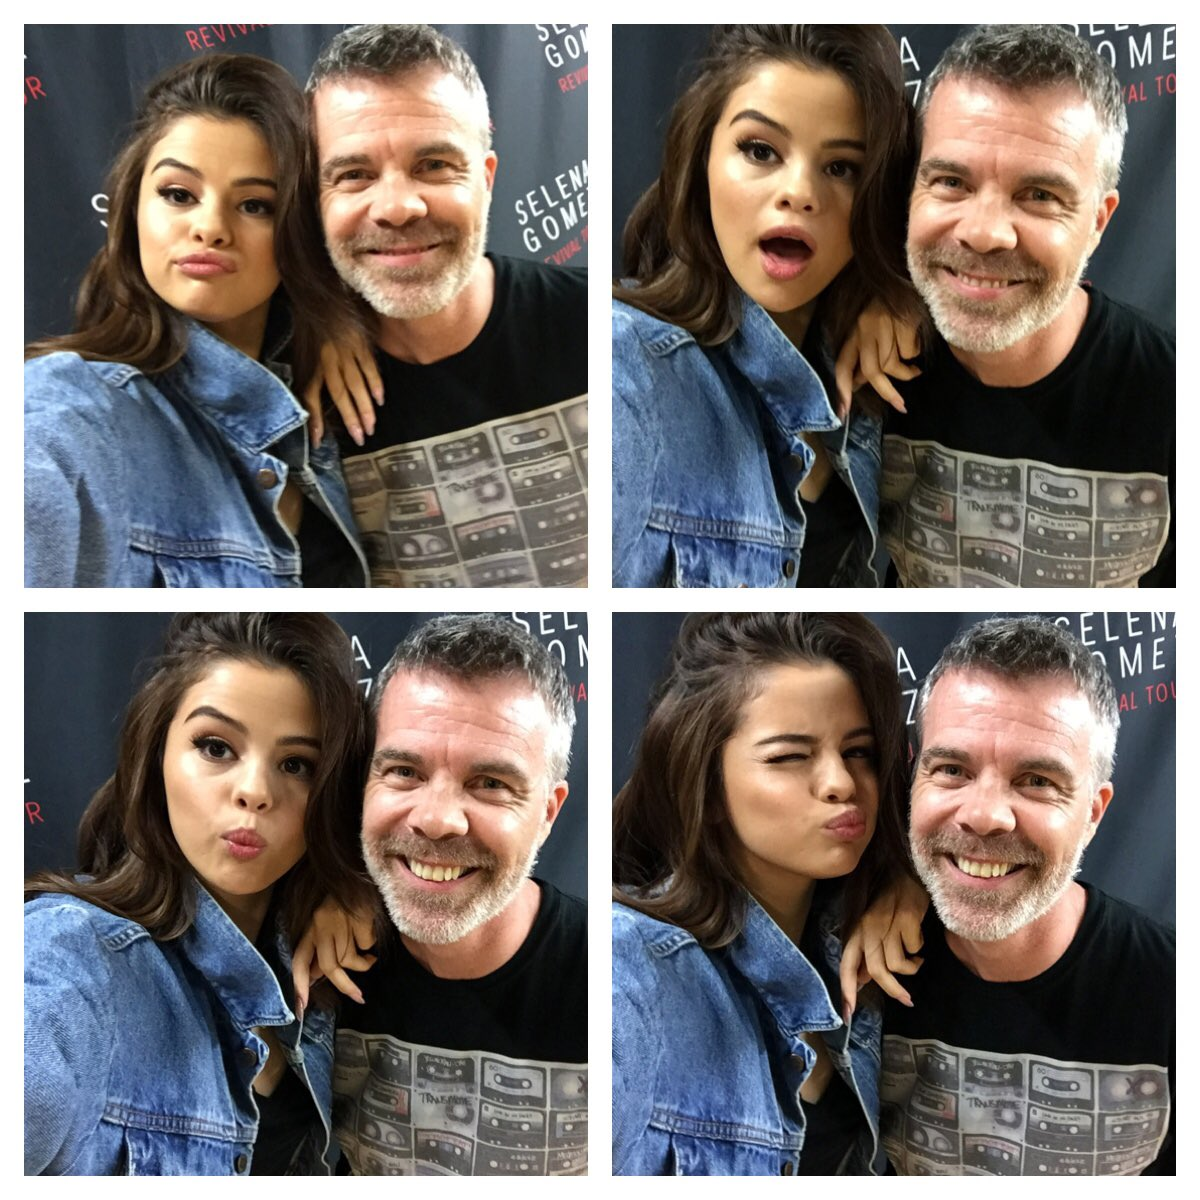 Selena took my phone again